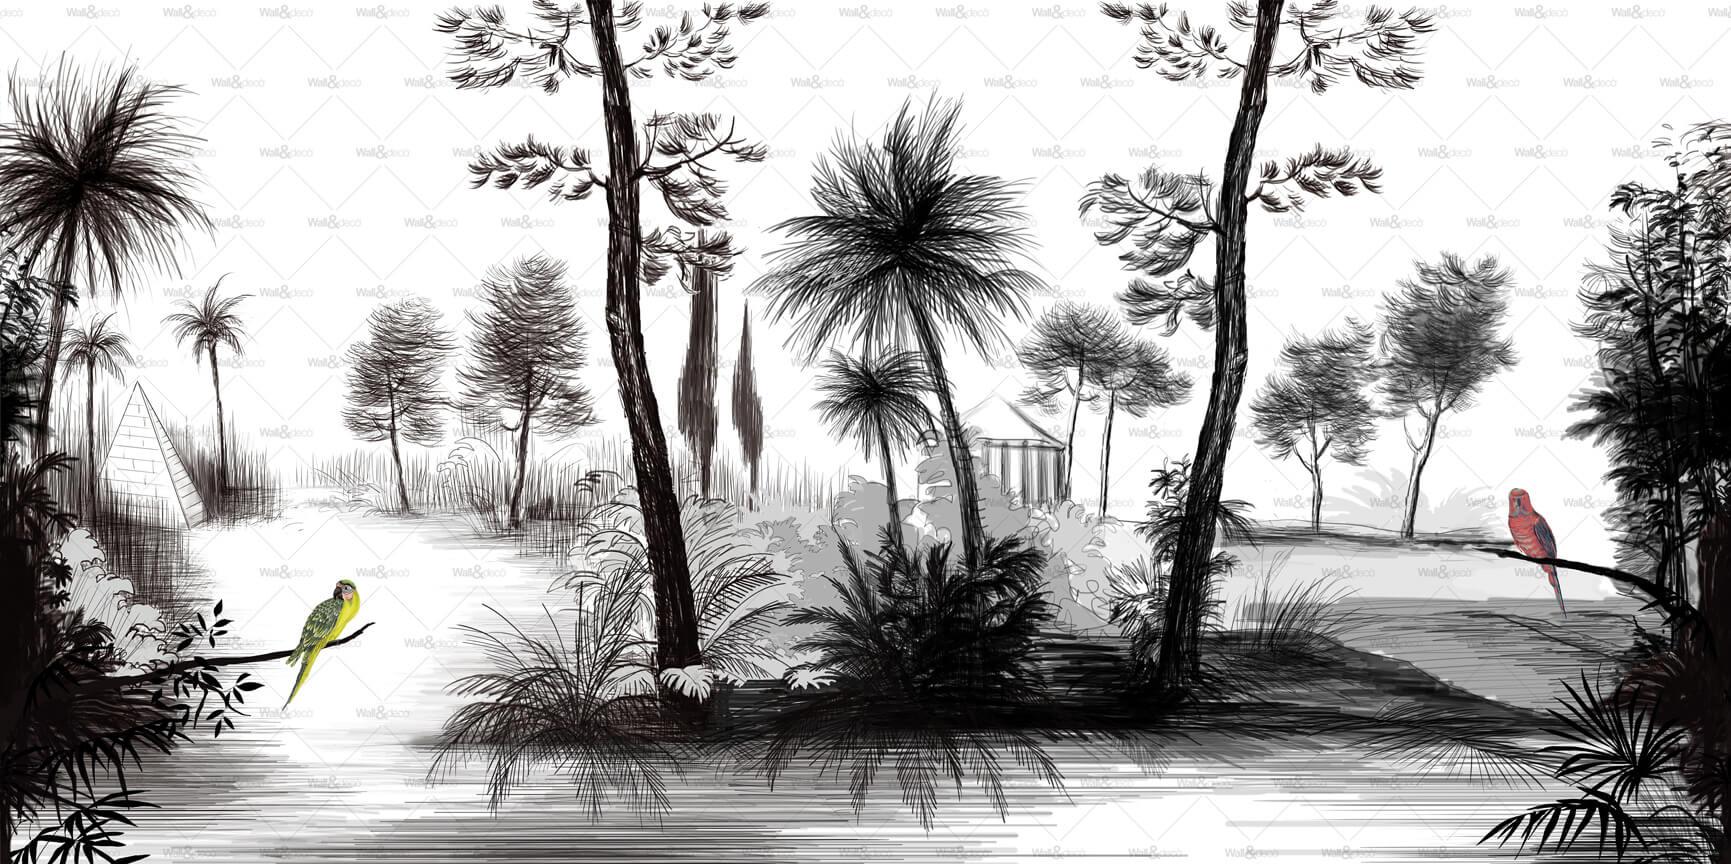 wet system imaginary paradise